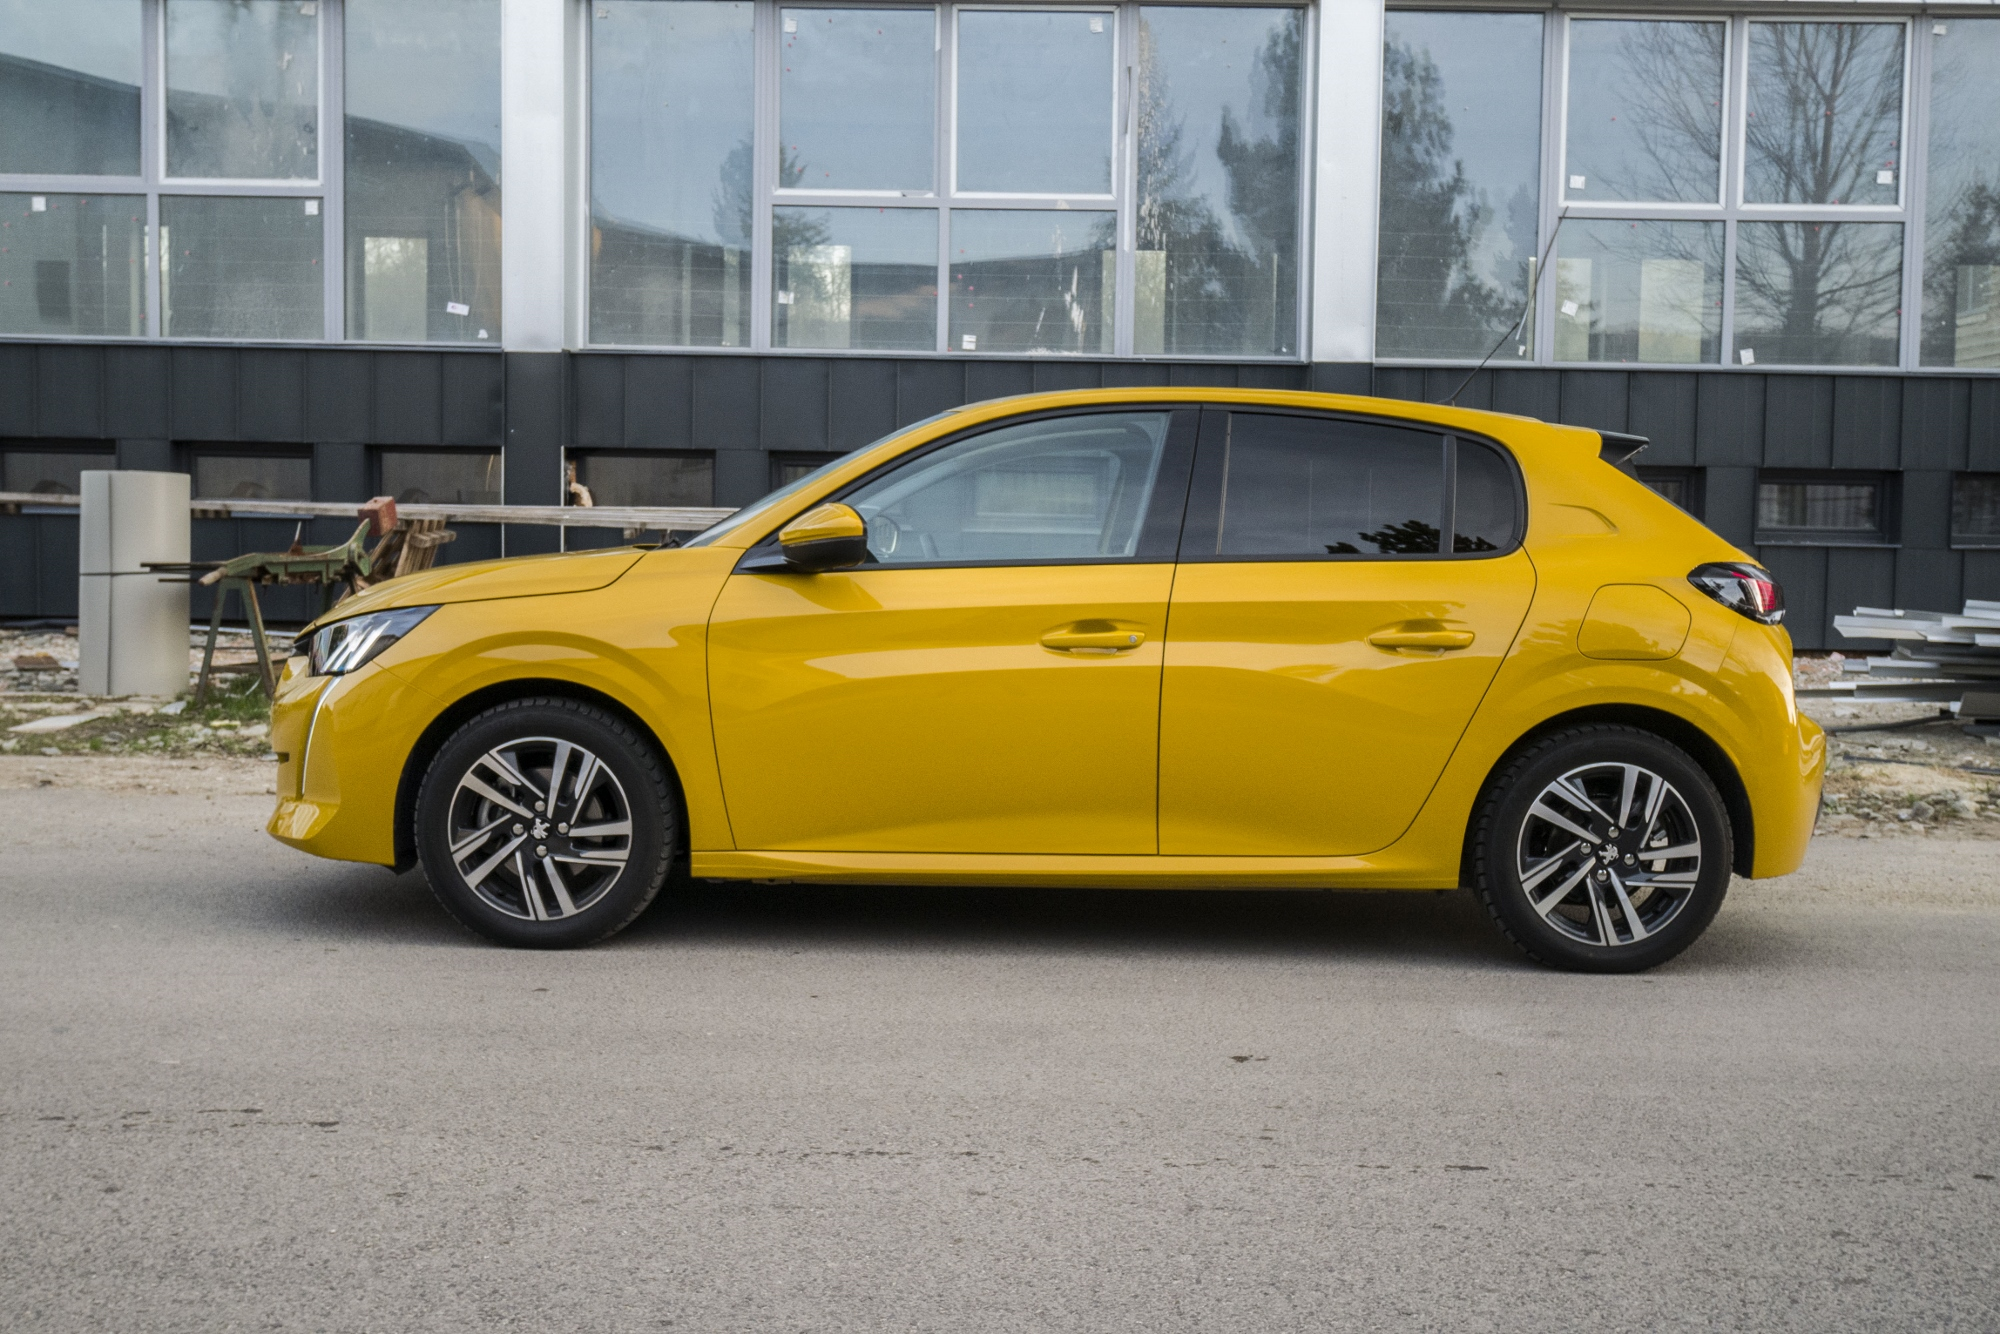 Test: Peugeot 208 prekvapivo pútal pohľady WCWY5Rwc8b peugeot-208-16